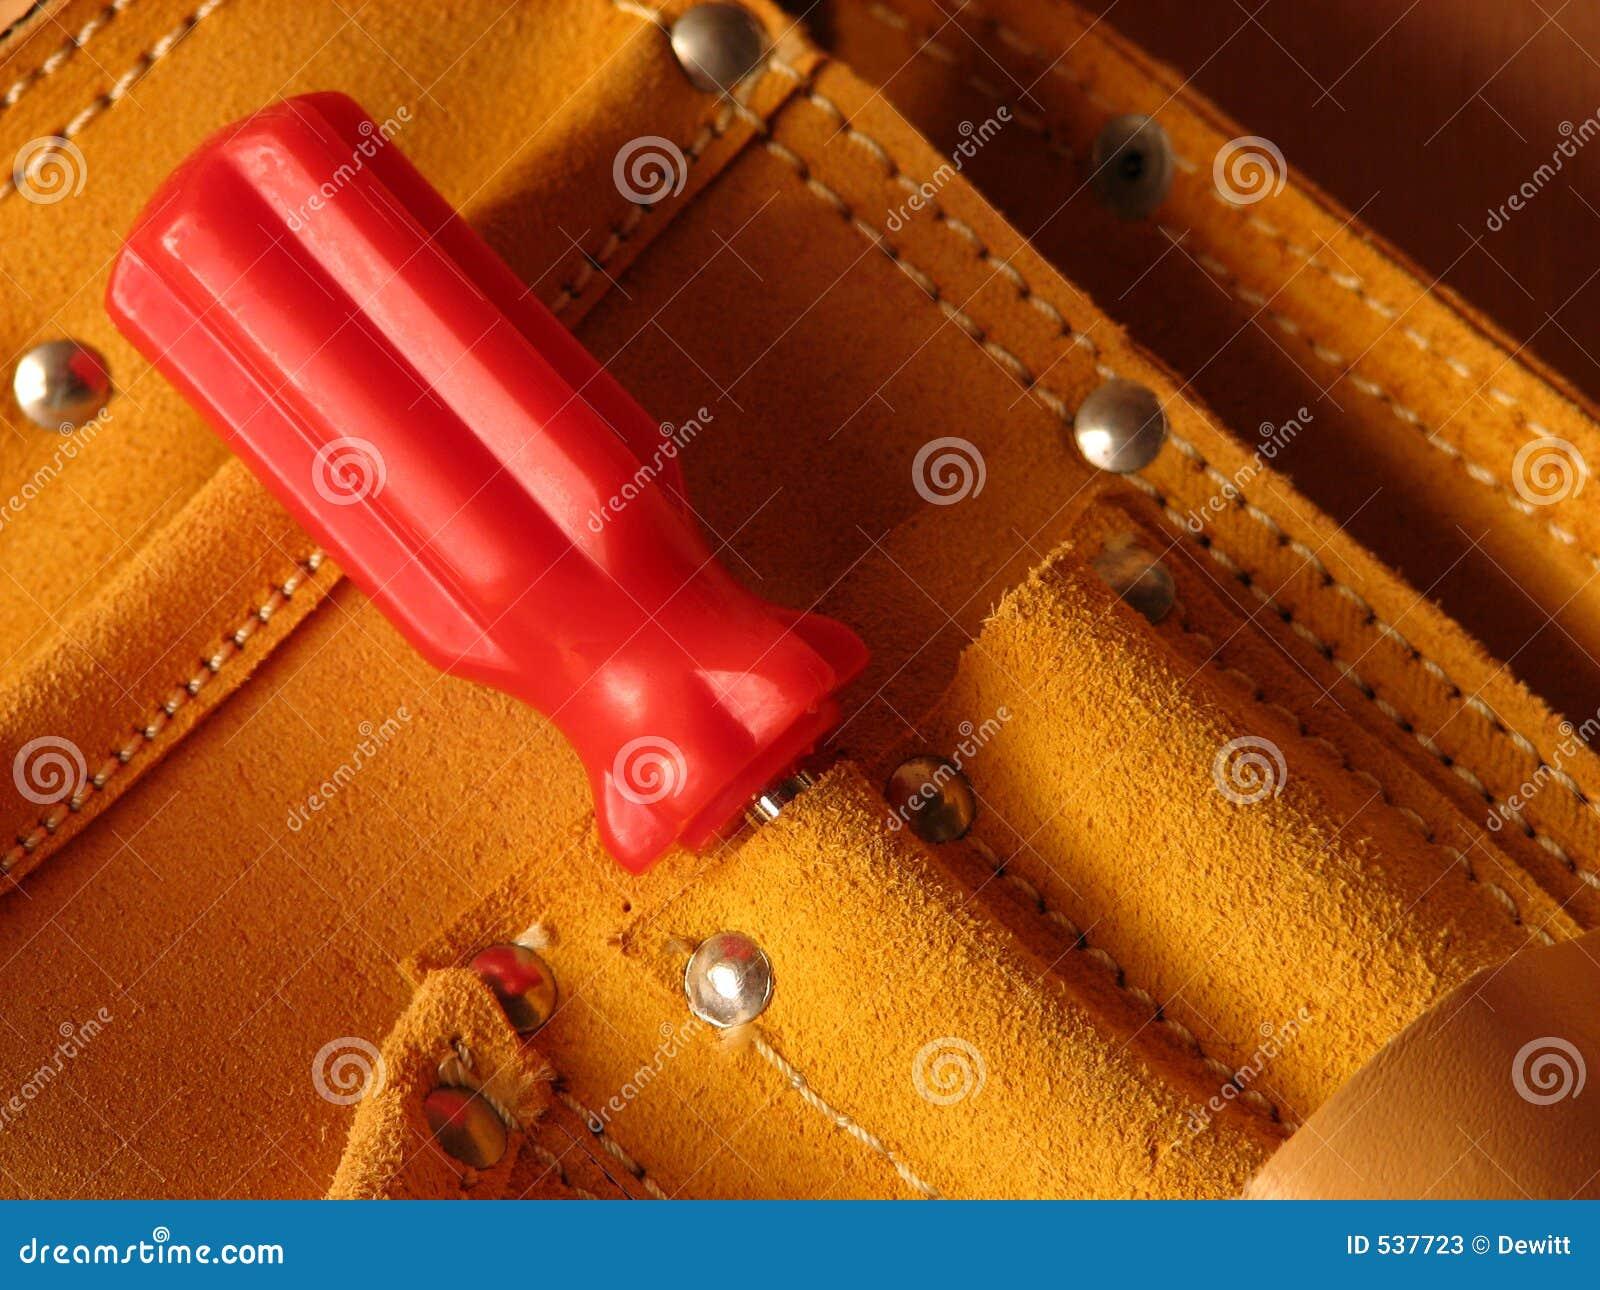 Download 传送带工具 库存图片. 图片 包括有 皮革, 工具, 水平, 红色, 建筑, 塑料, 工作, 木匠业, 螺丝刀 - 537723